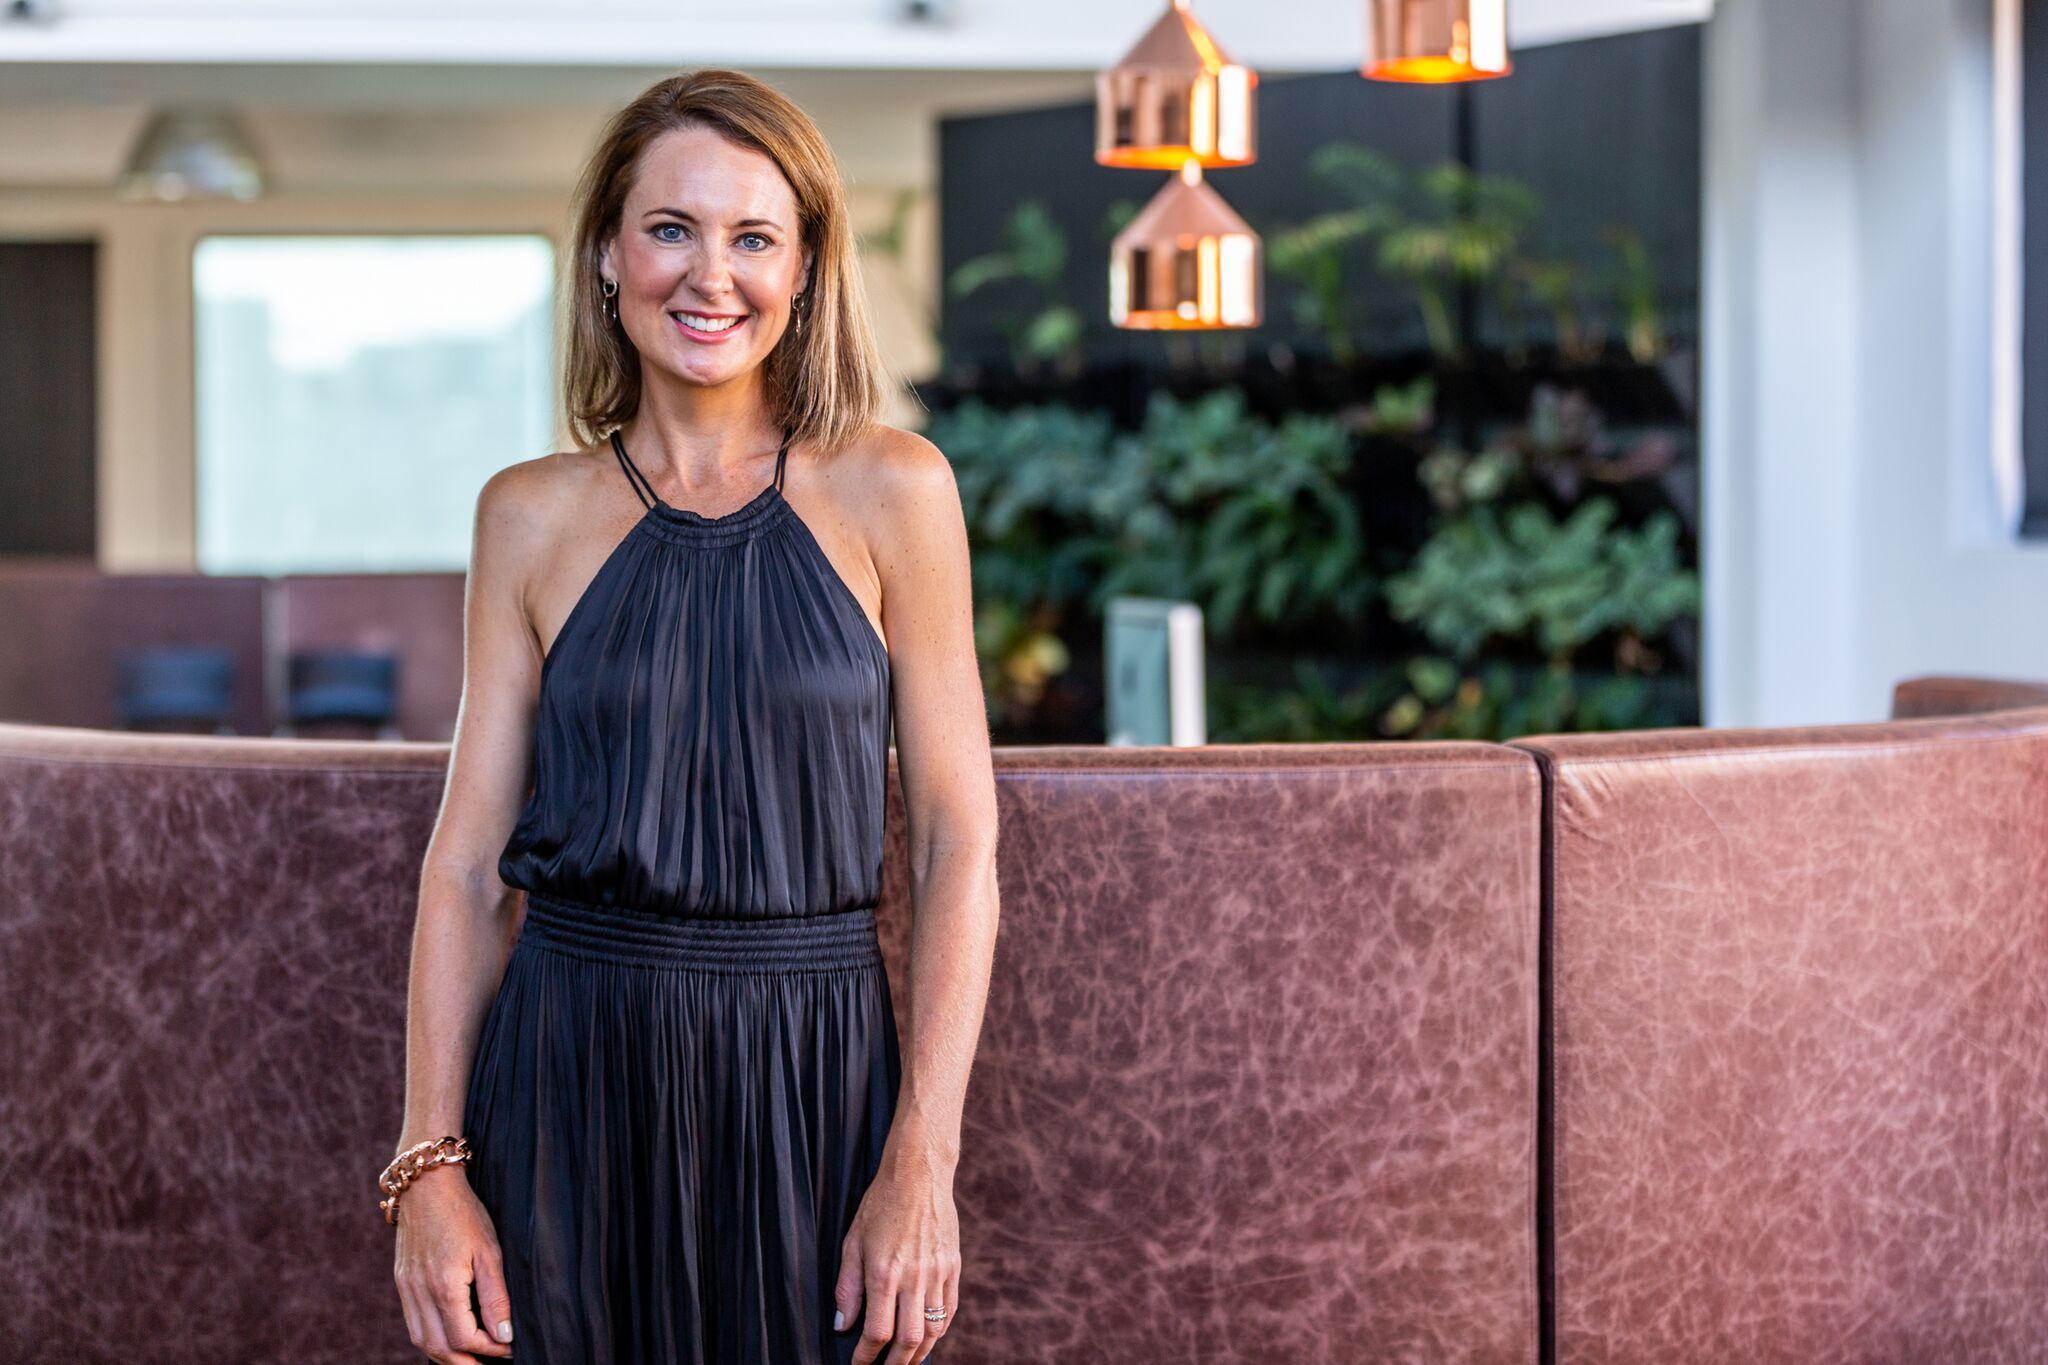 Alison Morgan, Business Coach